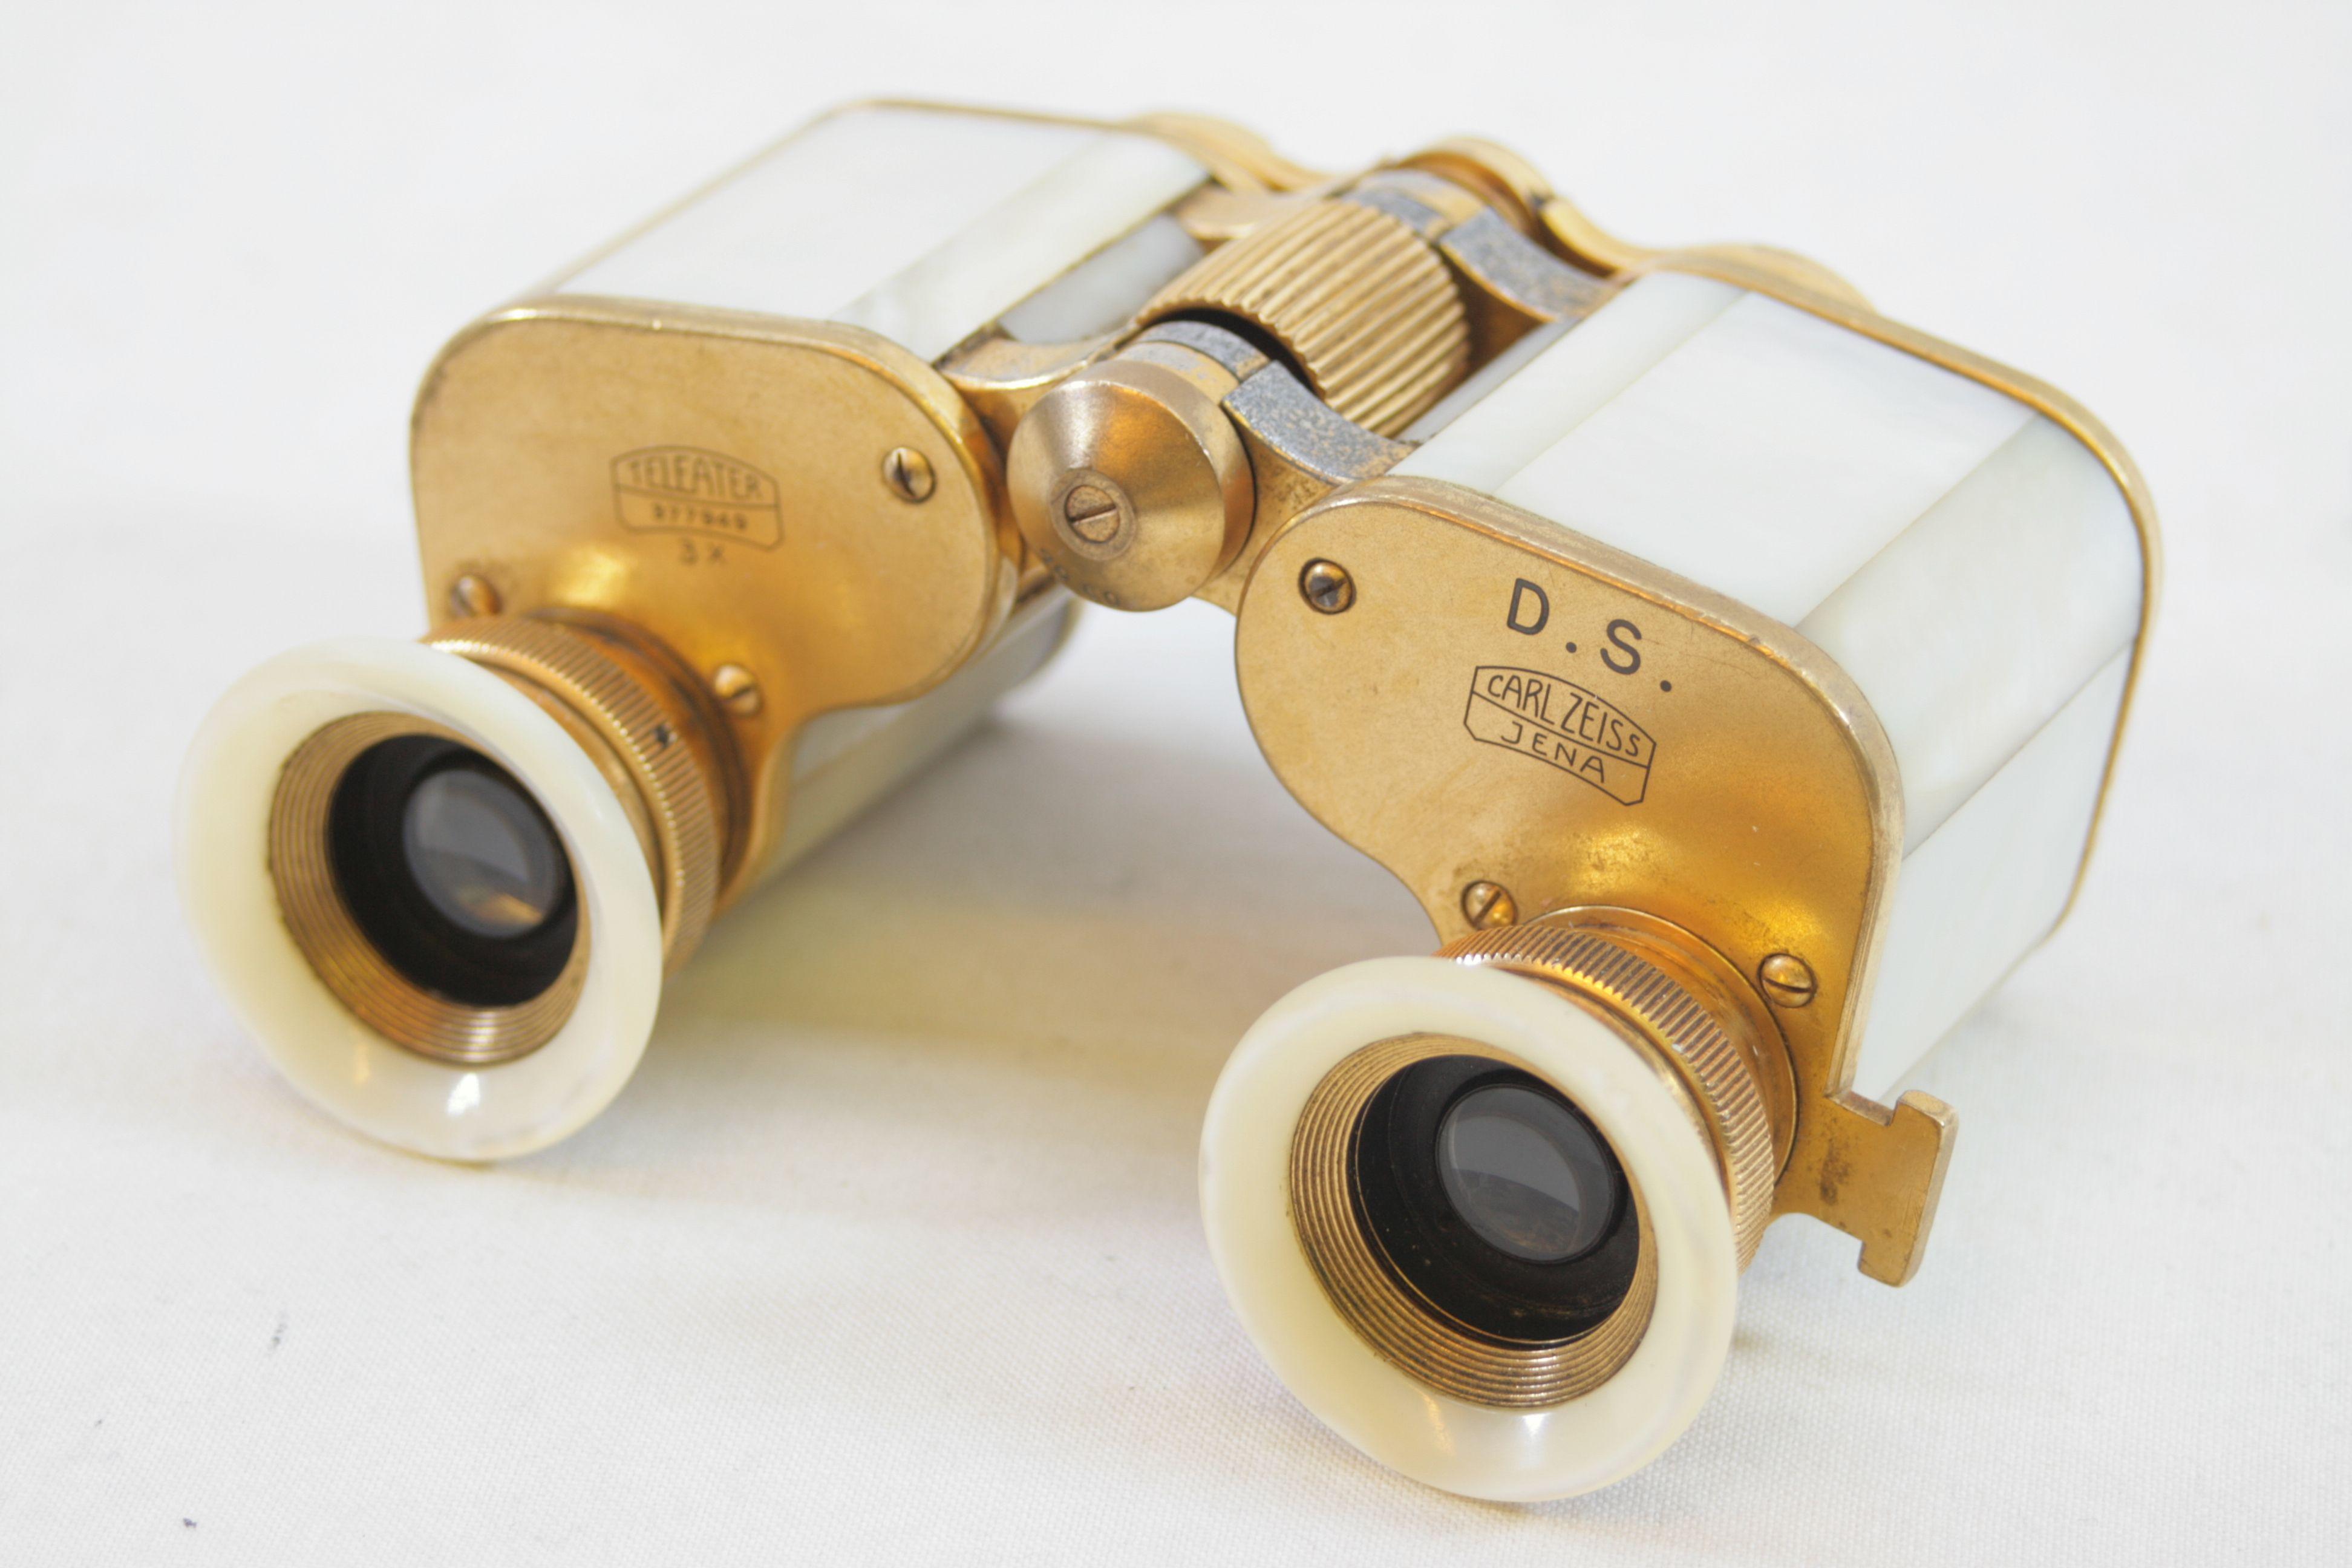 6c94ea02a86 Open Full-Size Image. Carl Zeiss Jena Teleater 3 x 13.5 Prismatic Pearl  Opera Glasses   Binoculars 3